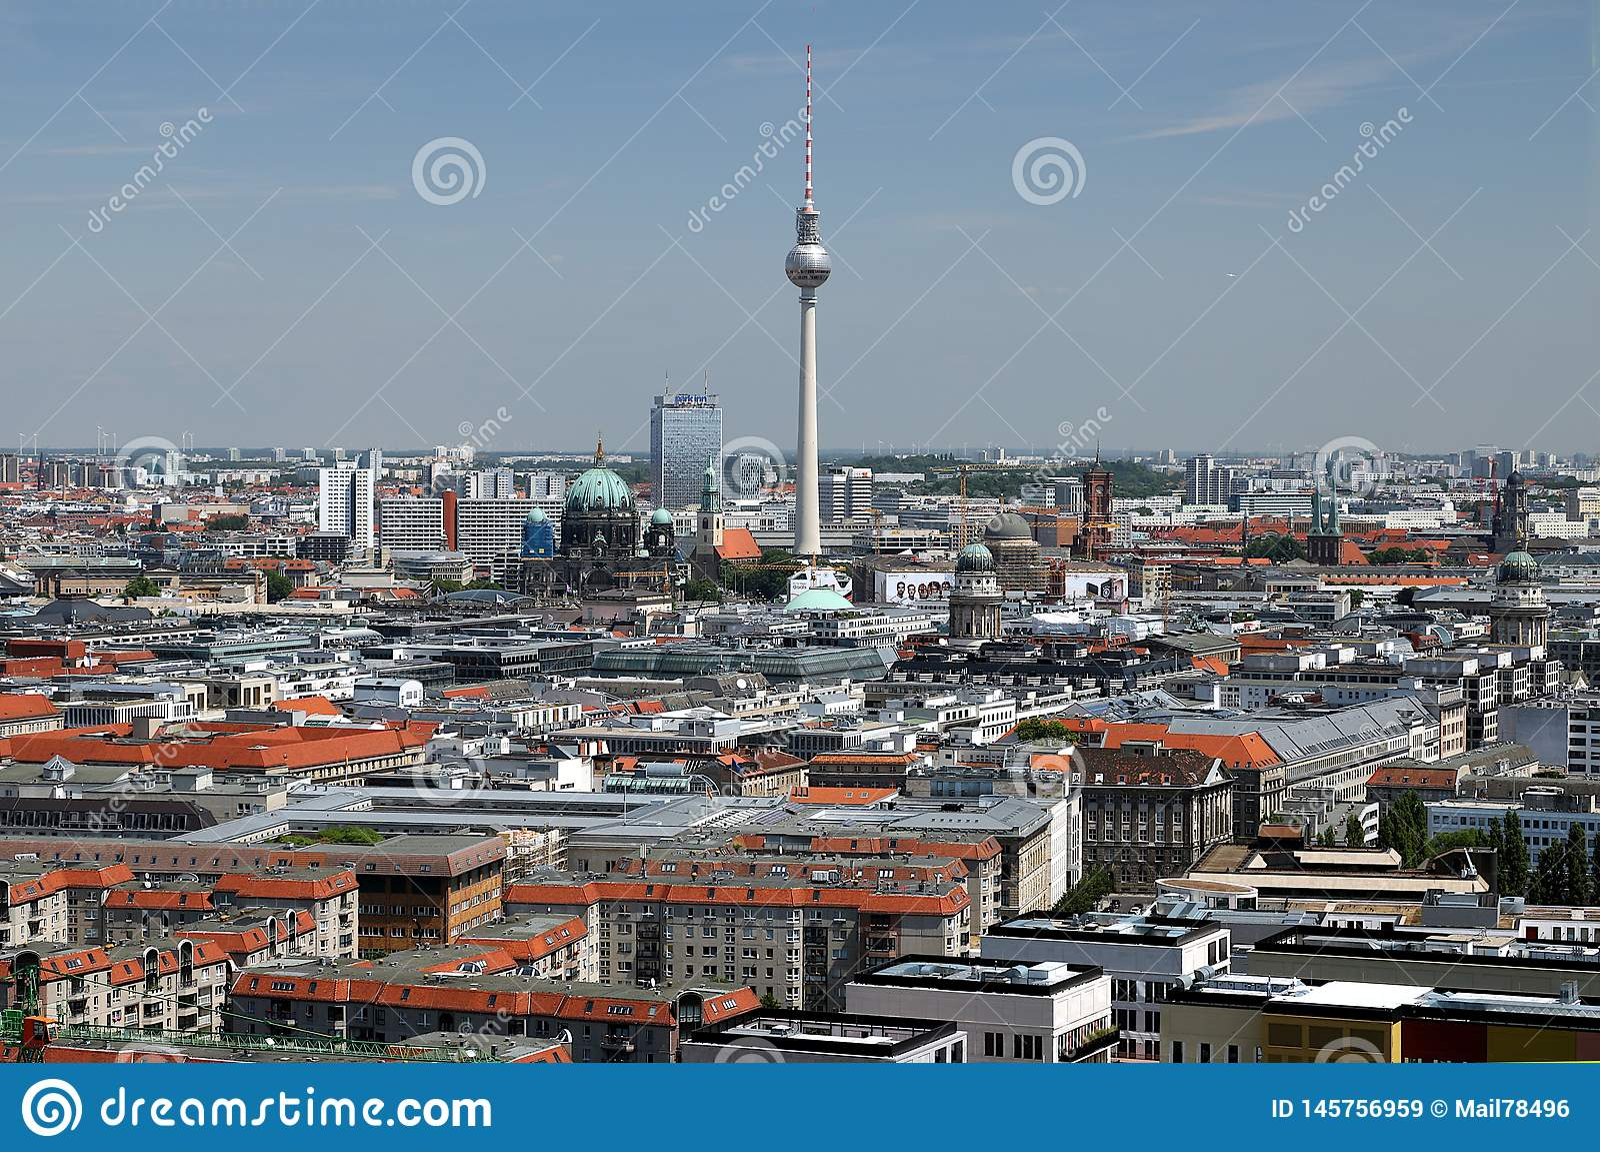 Berna 06/14/2018 Πανοραμική άποψη από την κορυφή ενός πύργου Potsdamer Platz